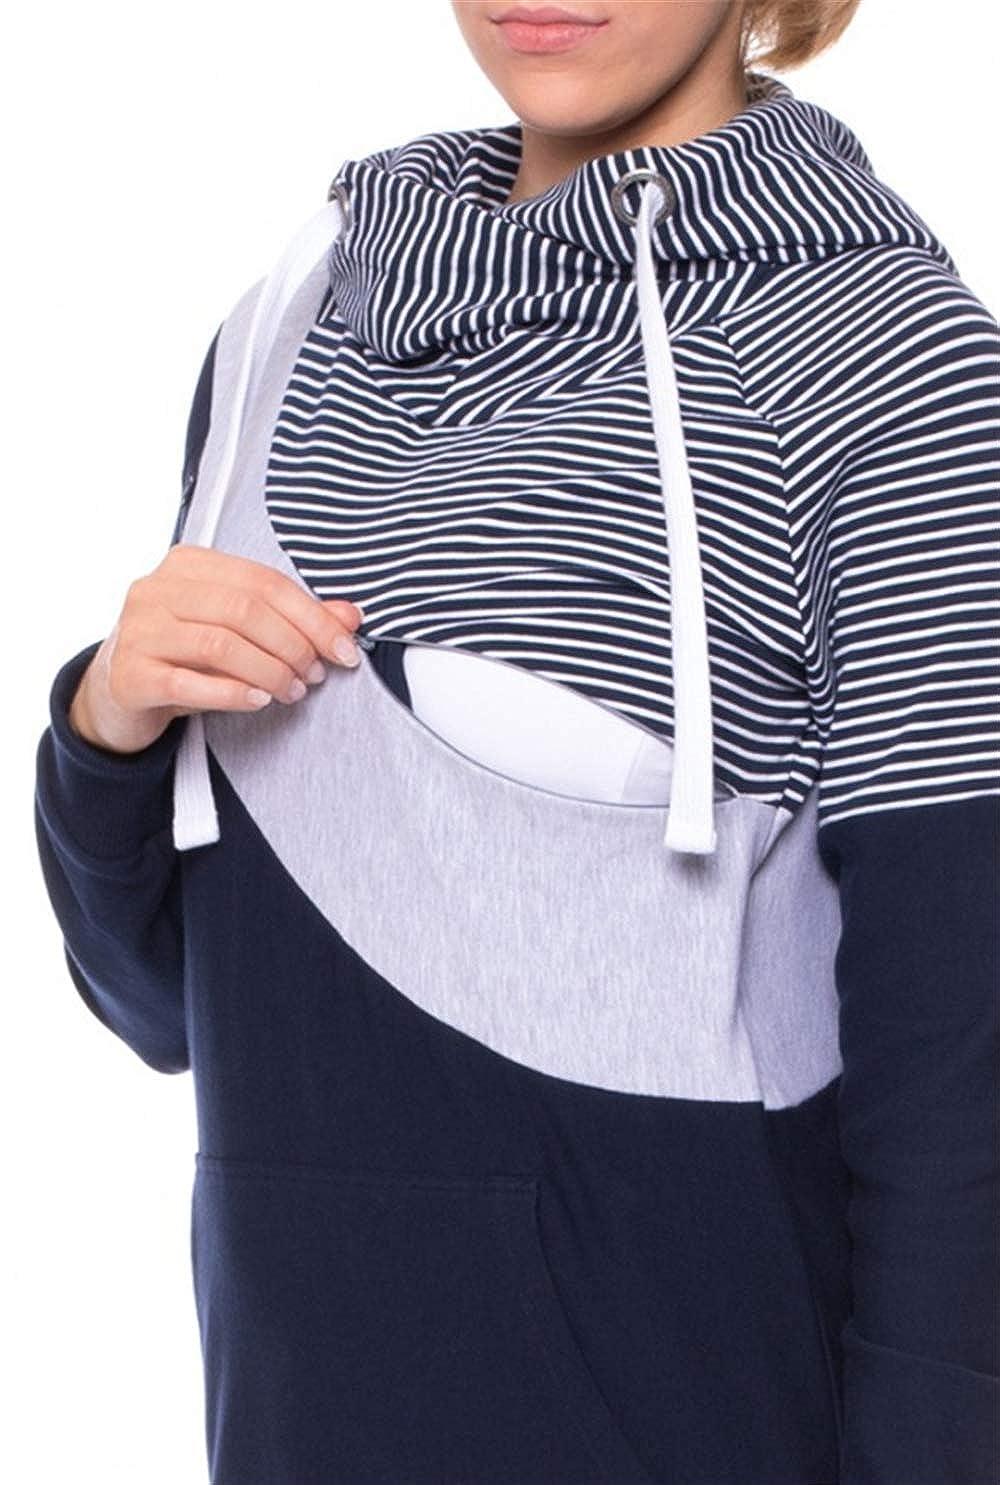 Pregnant Woman Pajamas Ultra Soft Maternity /& Nursing Pajama Set Pregnancy Sleepwear Stripe Pregnant Maternity Hooded Tops Blouse Outwear Clothes Breastfeeding Long Sleeve Clothes